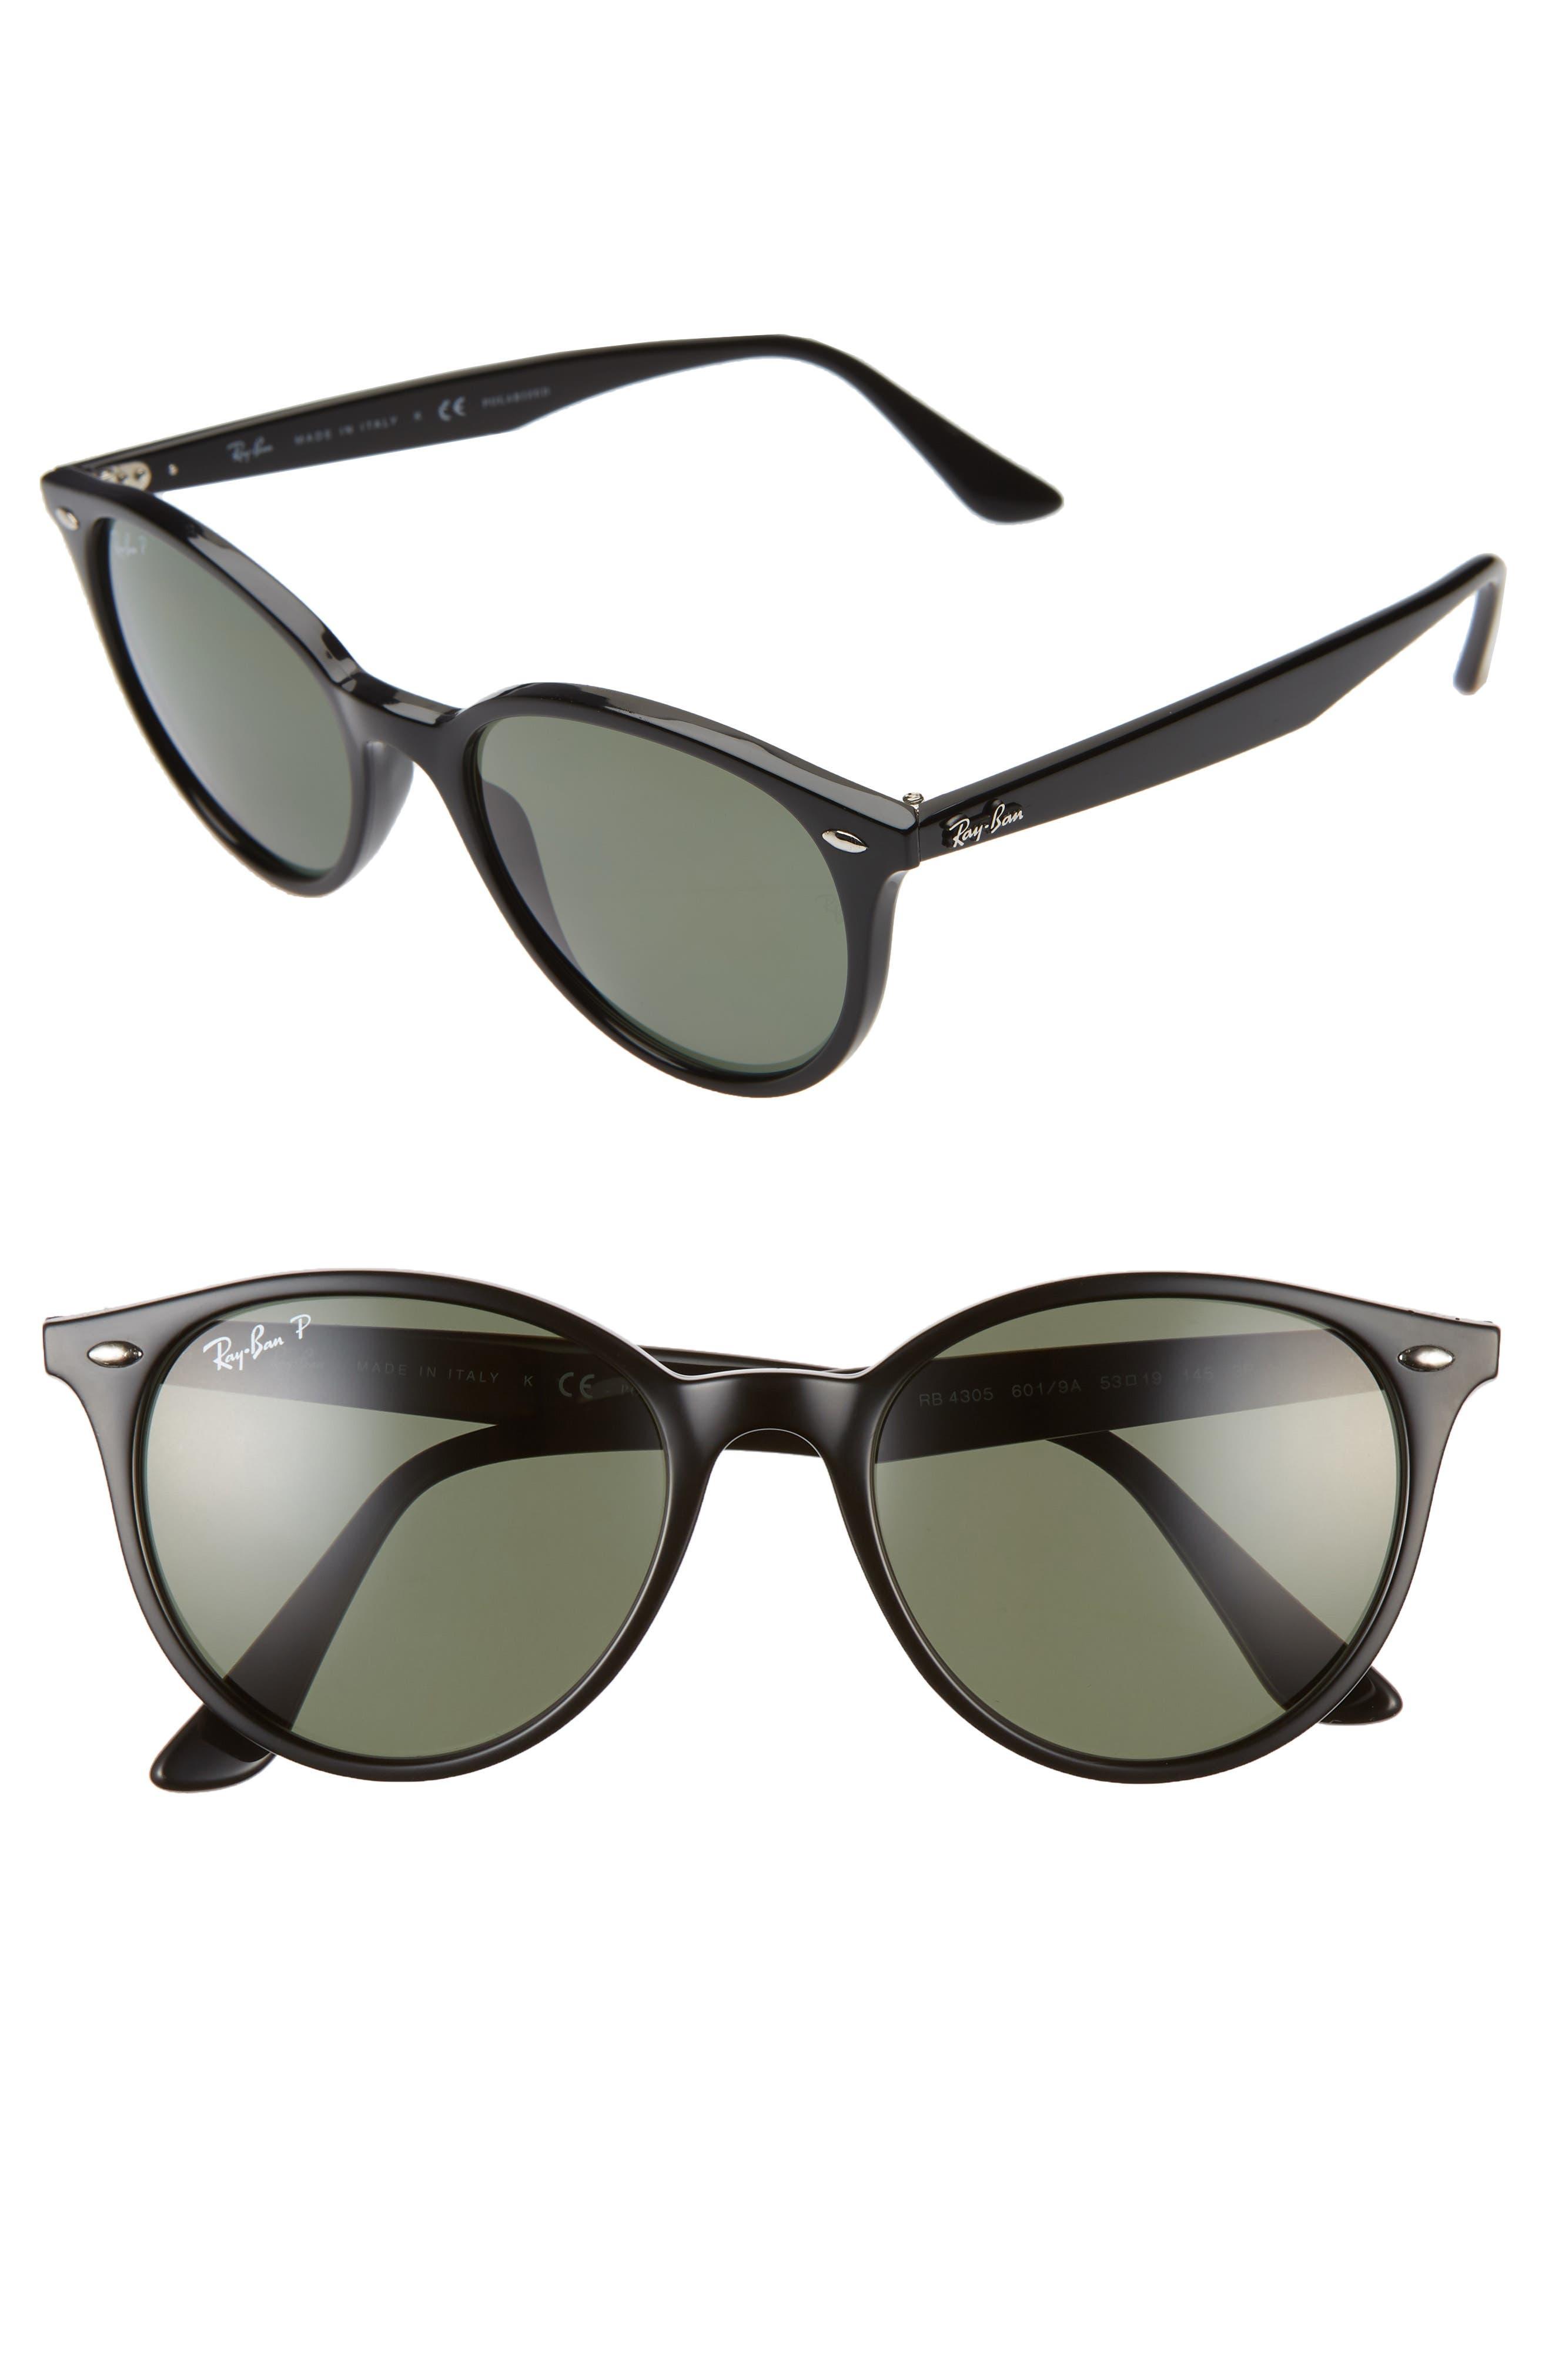 Ray-Ban Phantos 5m Polarized Round Sunglasses - Black/ Green Solid